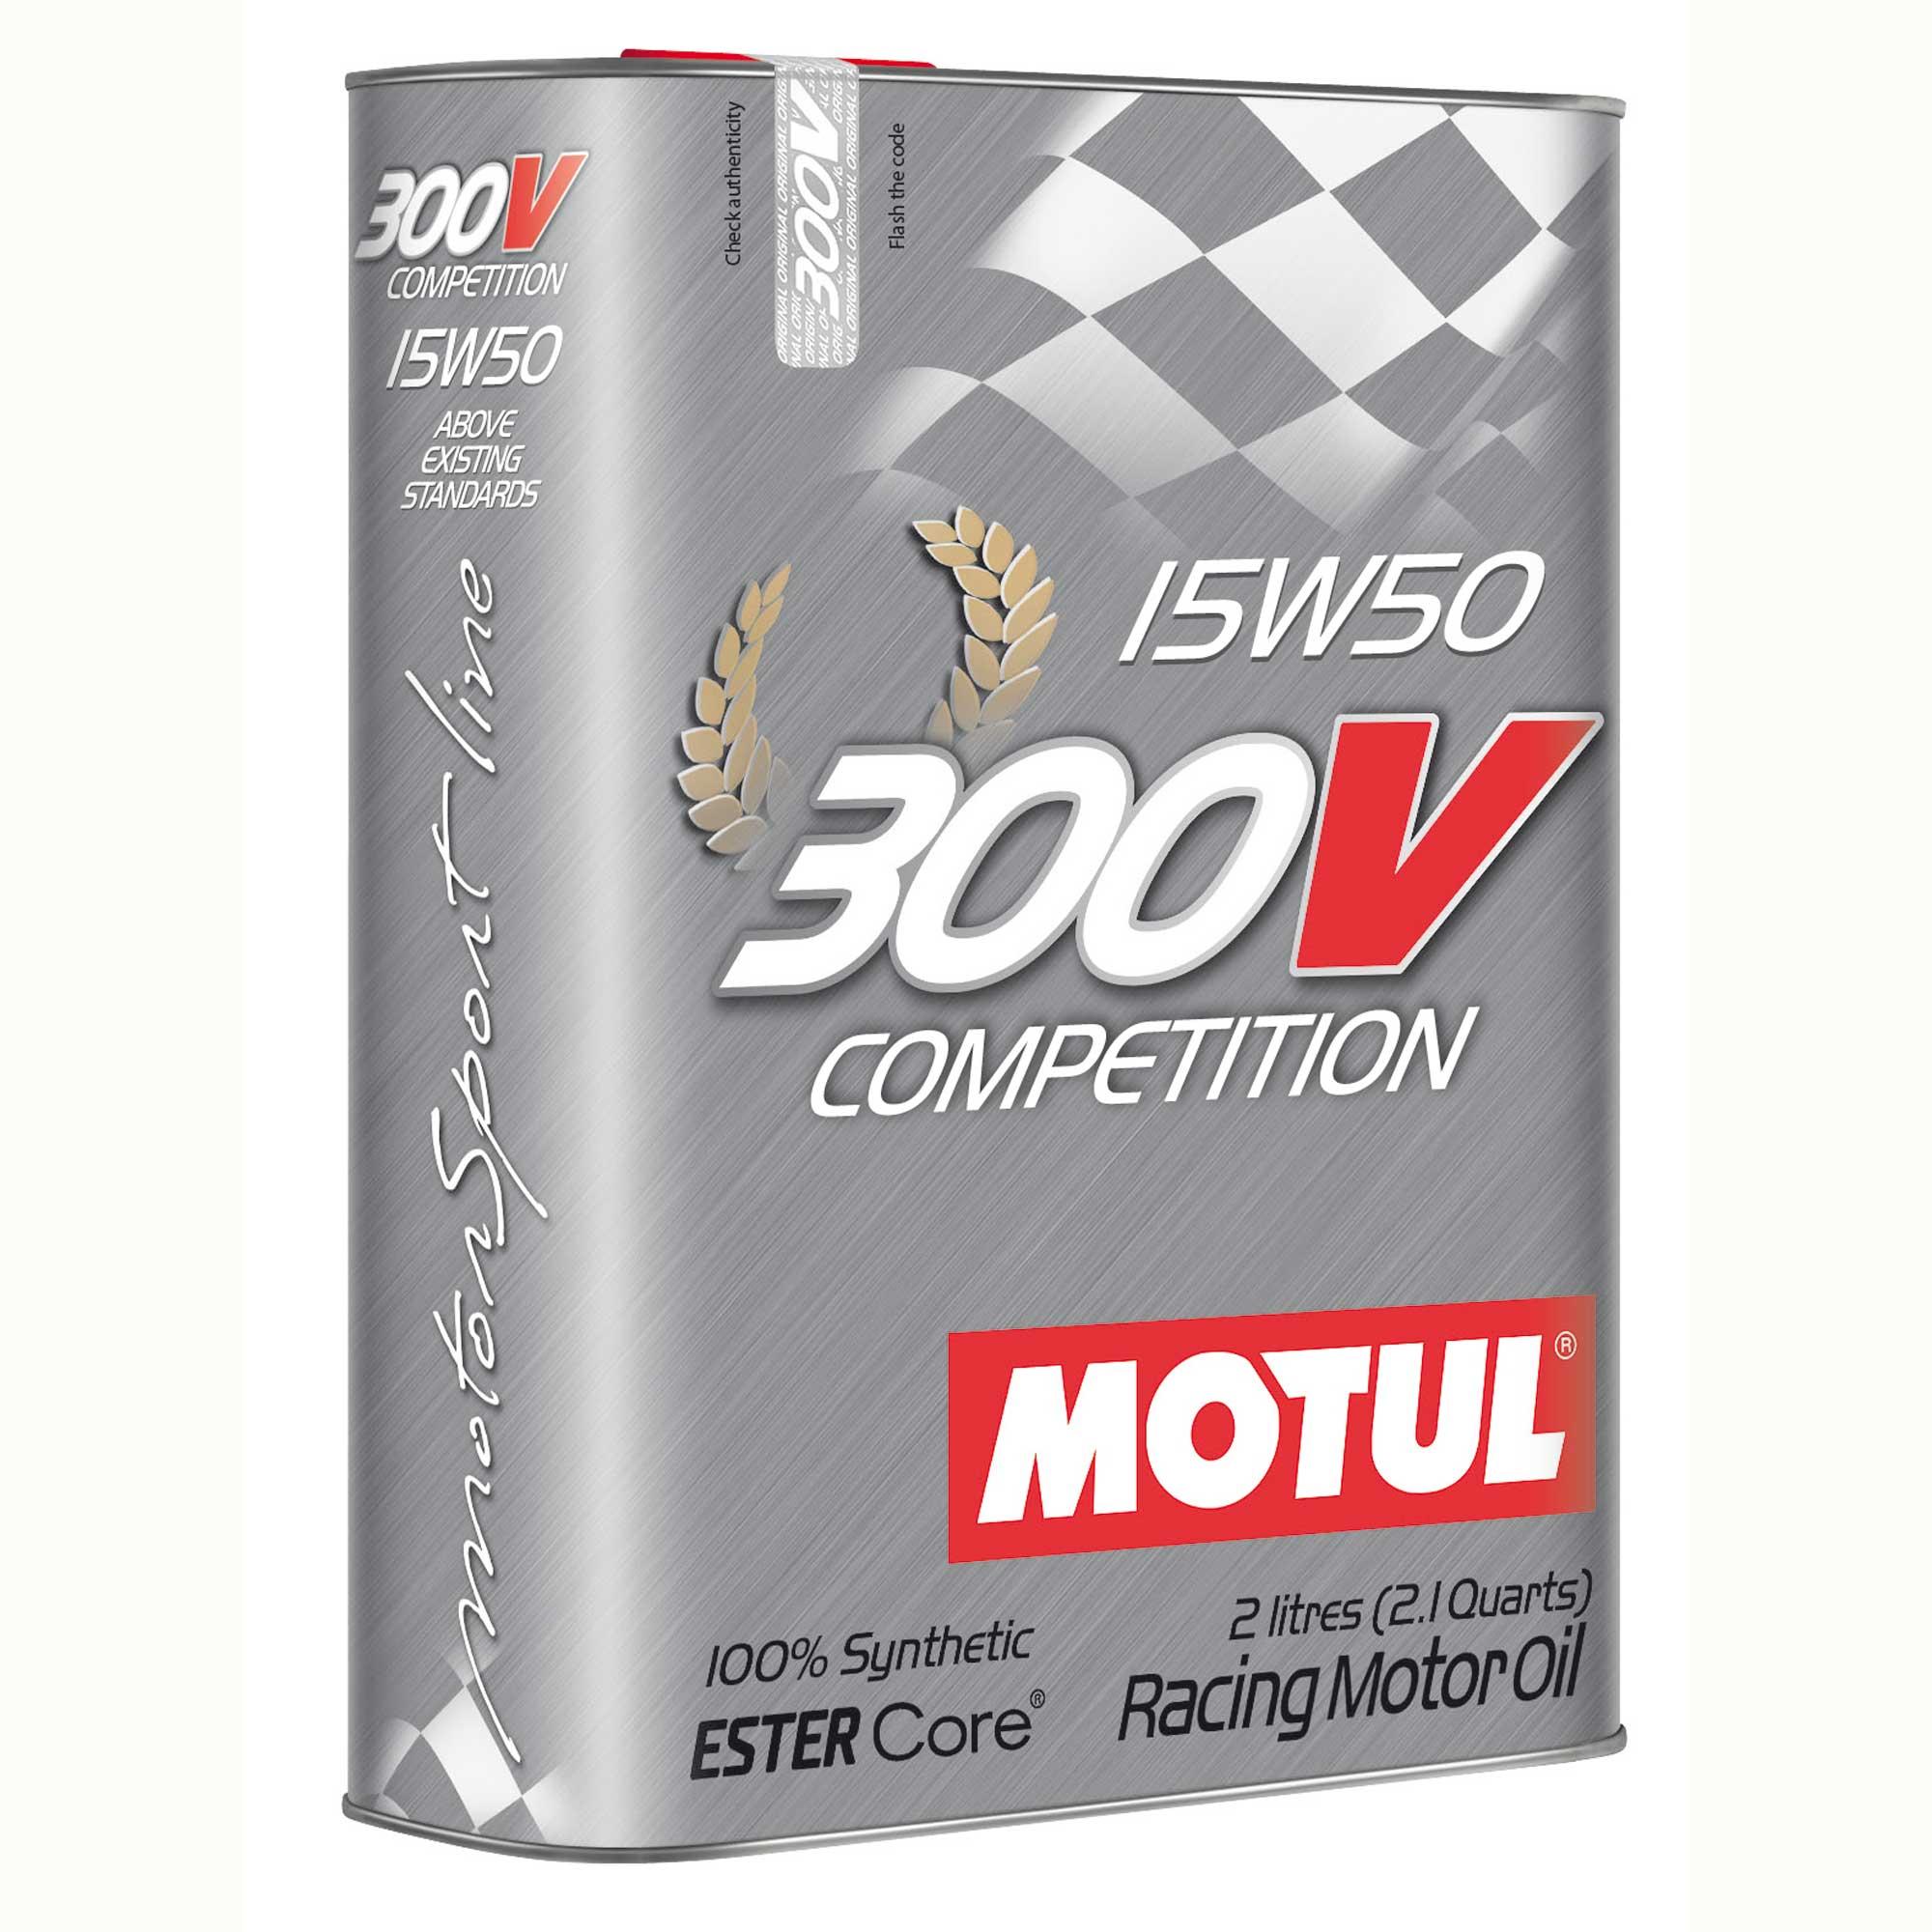 Motul 300v 15w50 Competition 2 Lts 100% Sintético